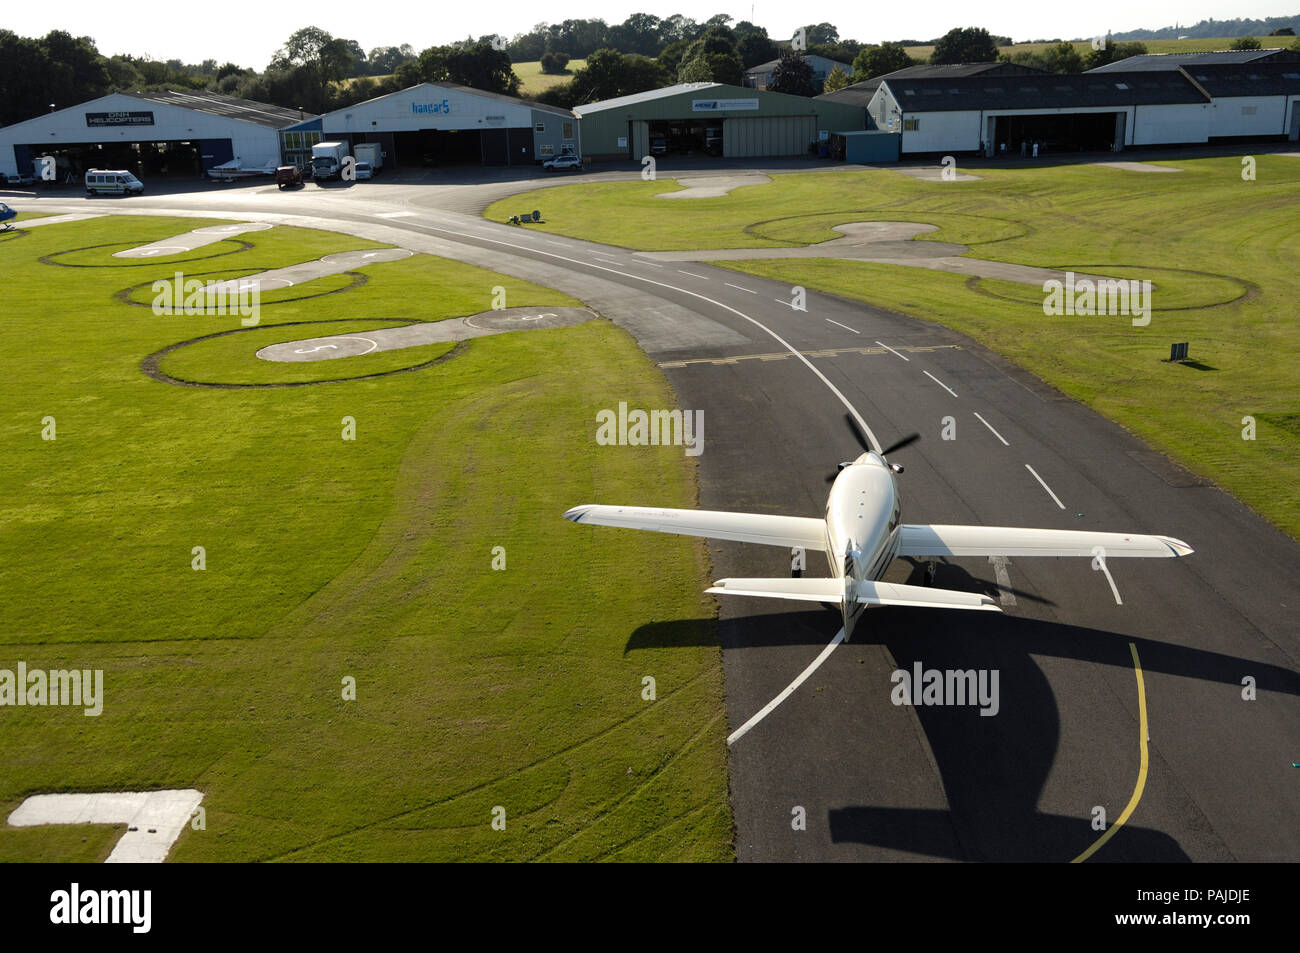 Farnborough F1 Kestrel taxiing with hangars behind Stock Photo